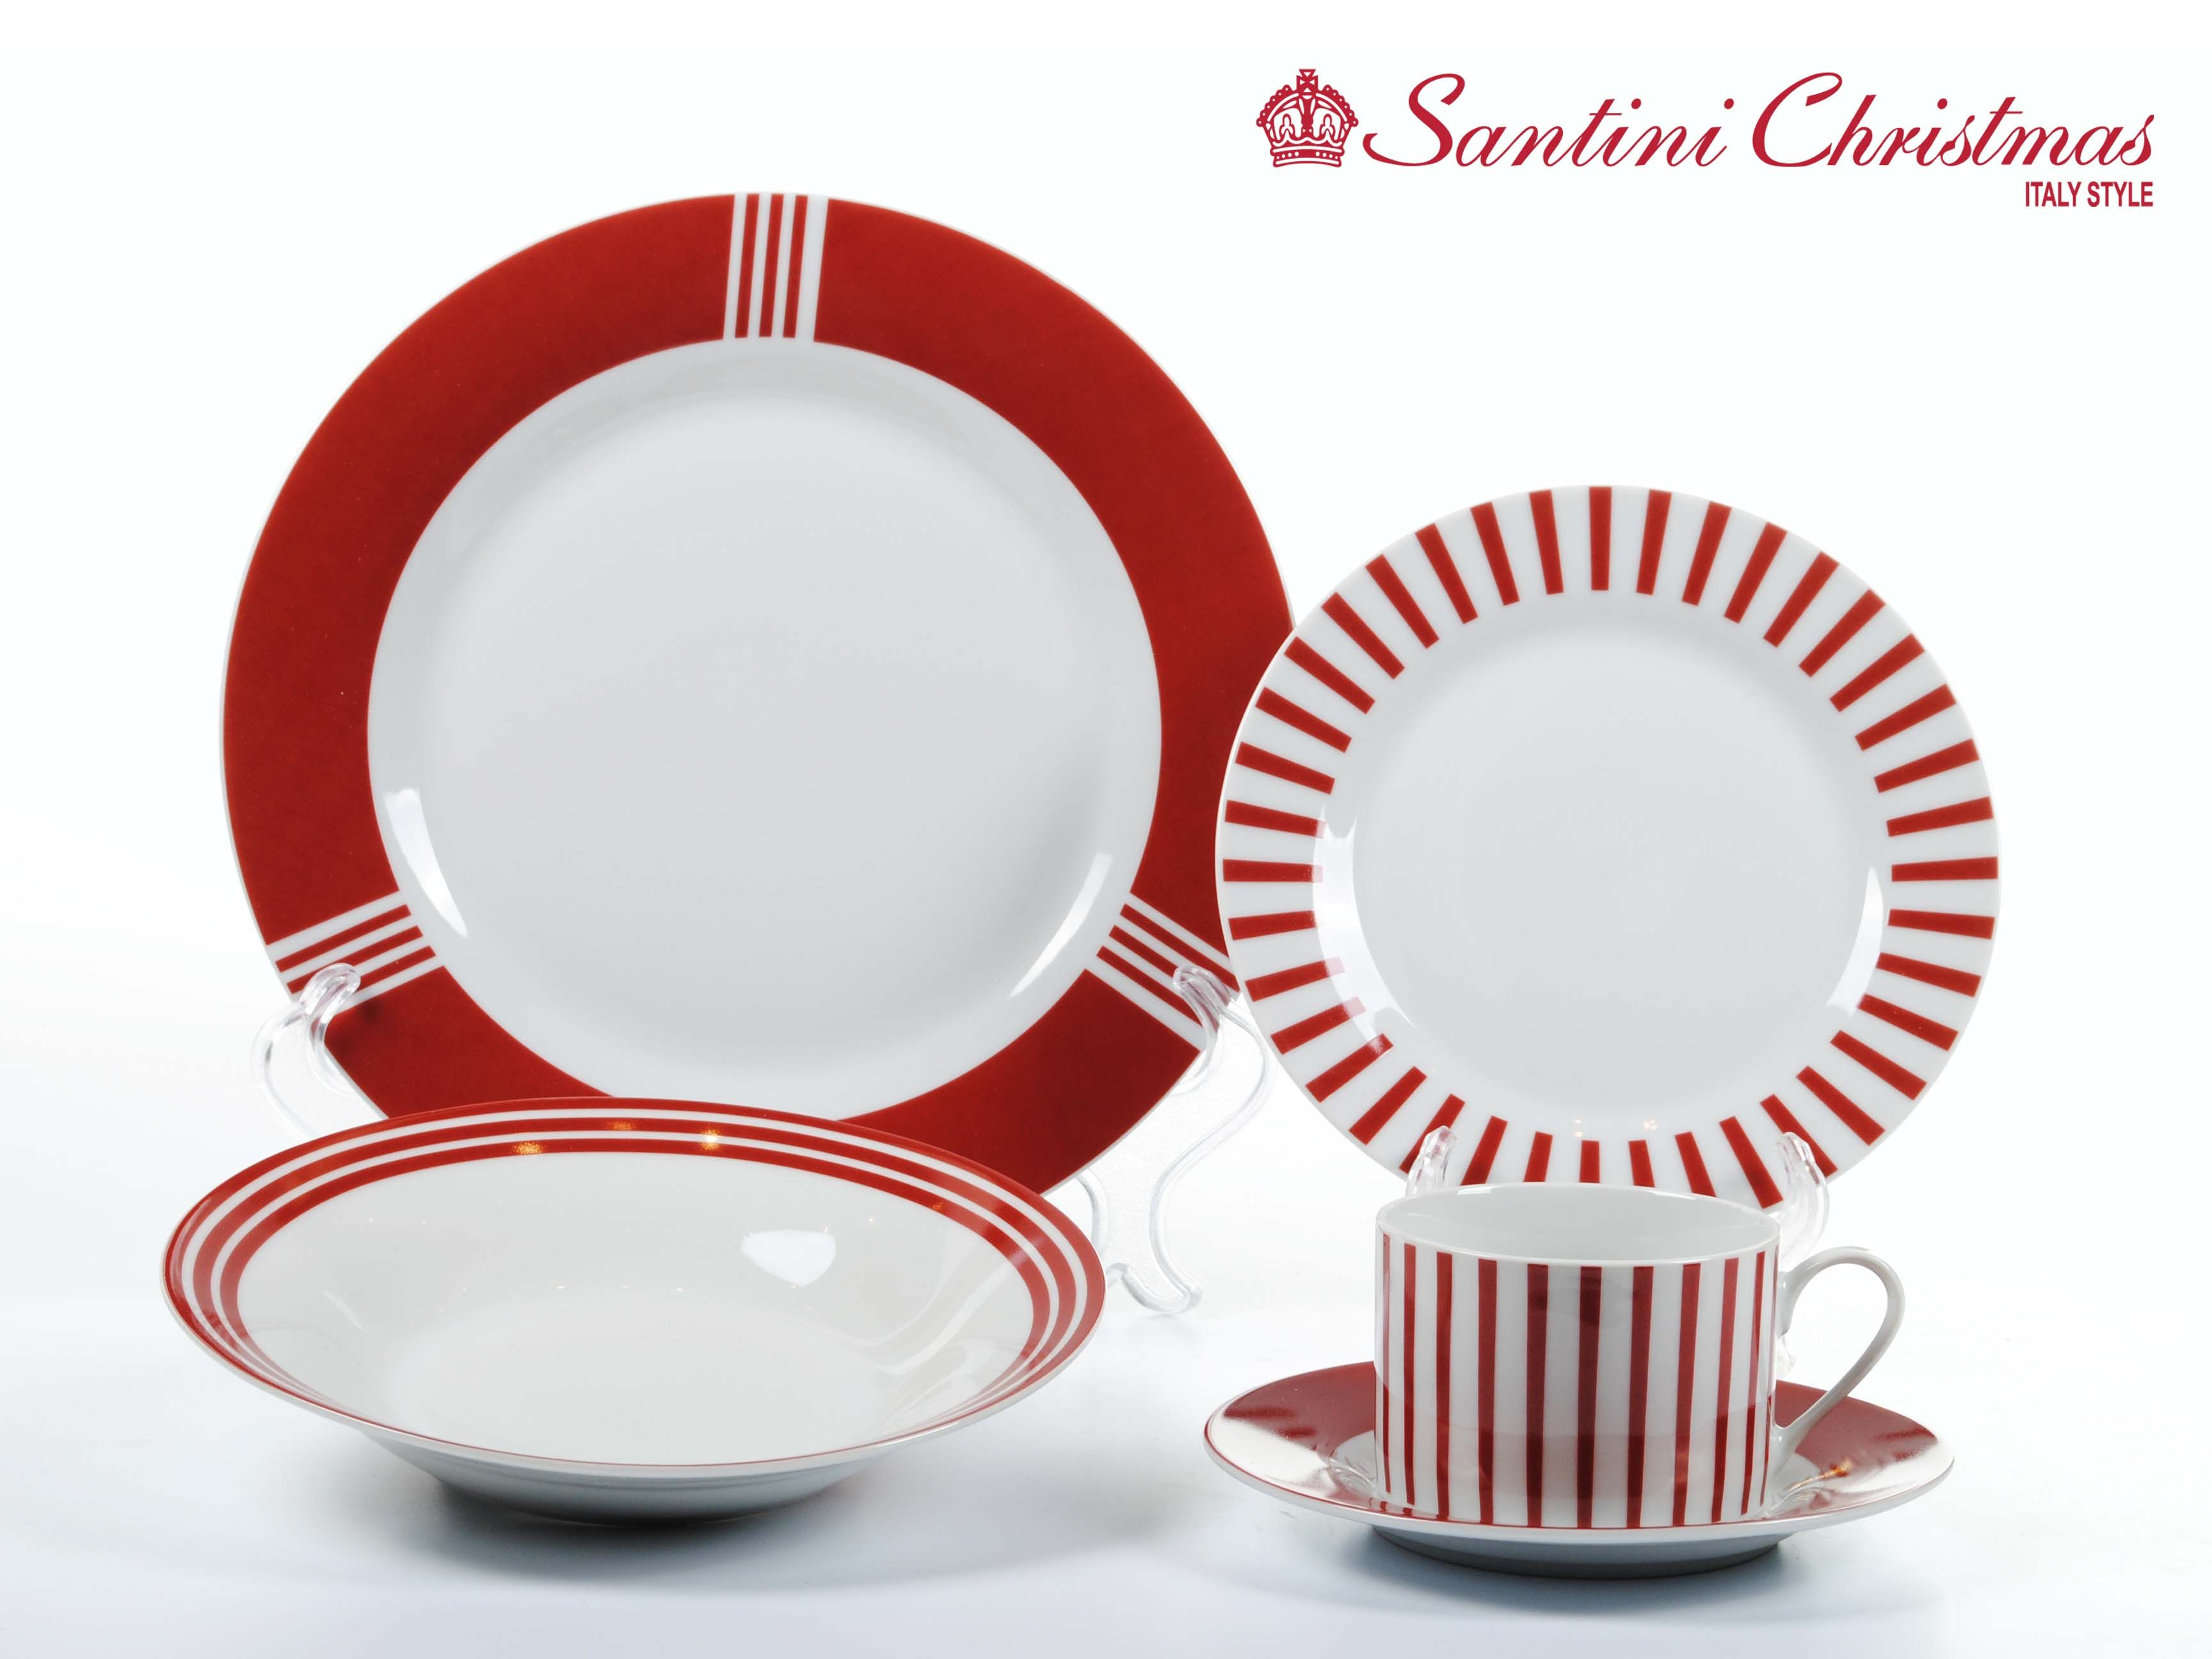 Vajilla navide a candy cane dinnerware set cer mica pintada navidad vajilla de navidad y - Vajillas navidenas ...